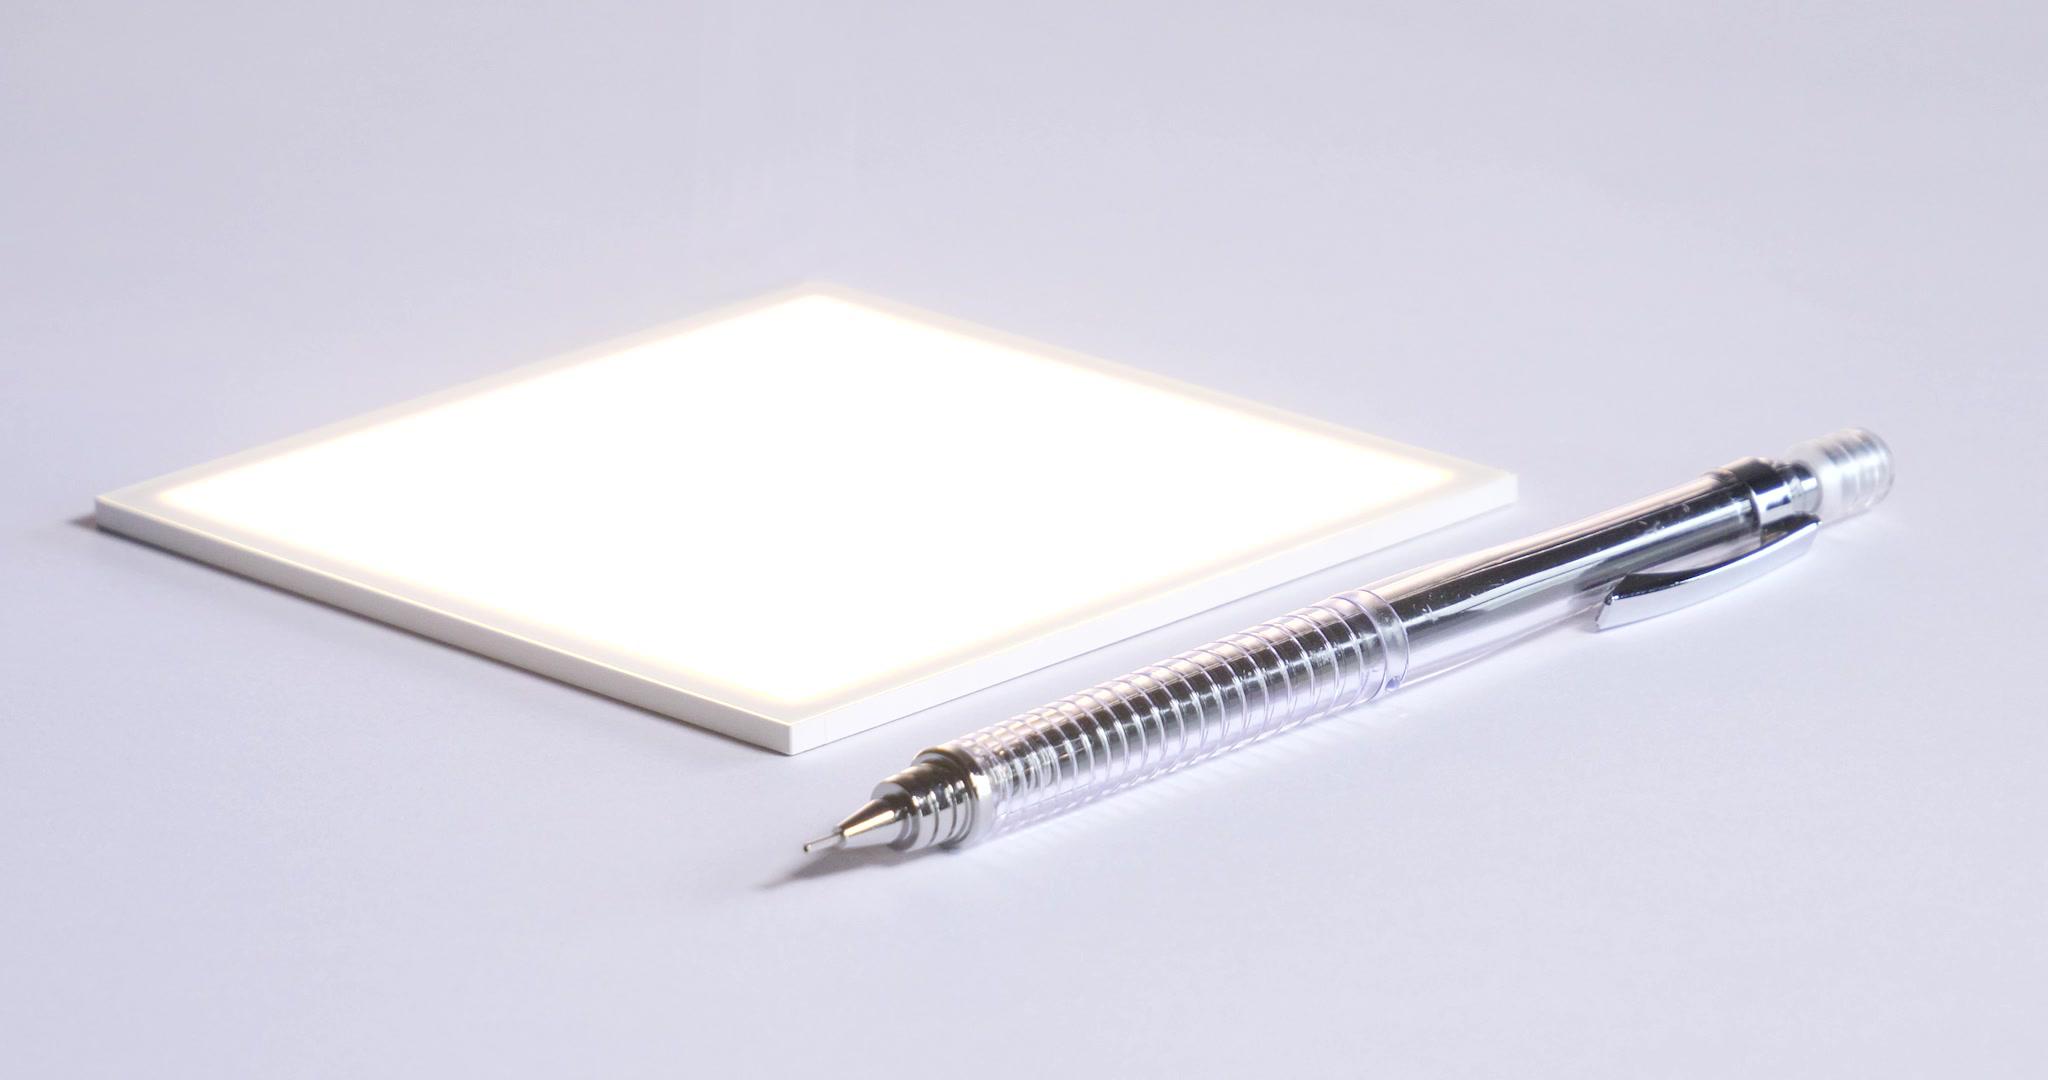 Hikari and pen_NO CABLE.jpg